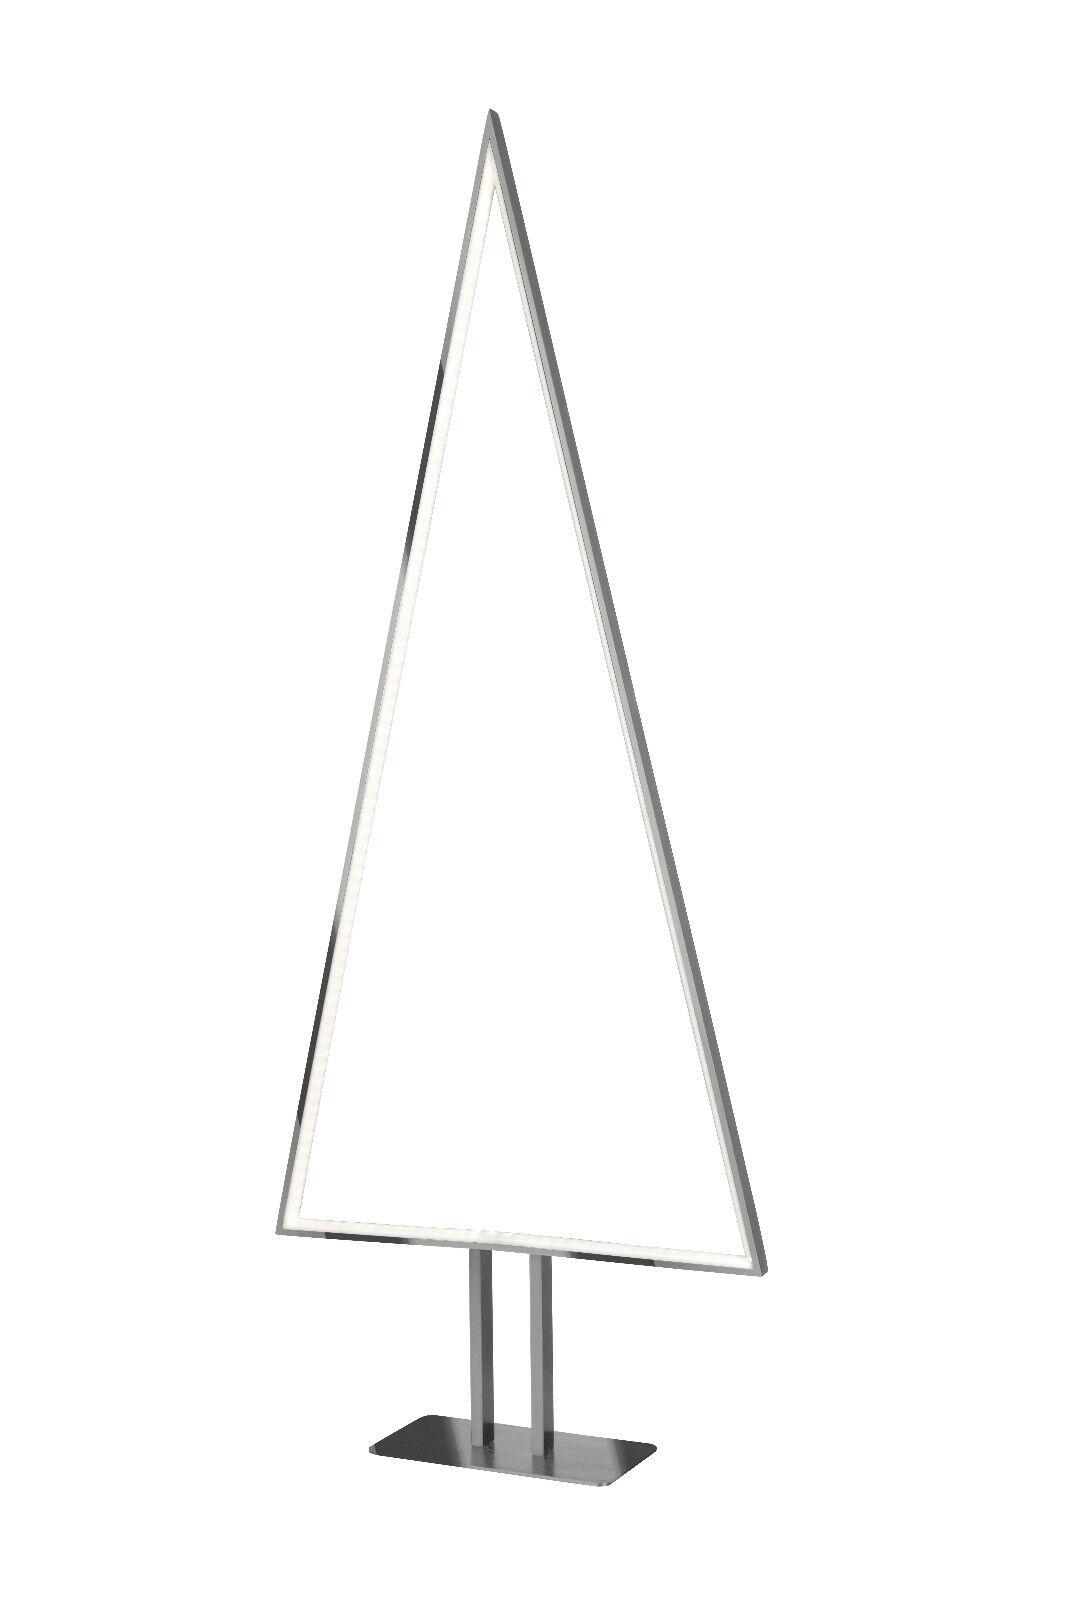 Sompex Tischleuchte Pine Aluminium Tisch Boden Leuchte Lampe LED LED LED 50 oder 100cm | Erste Klasse in seiner Klasse  50b26c